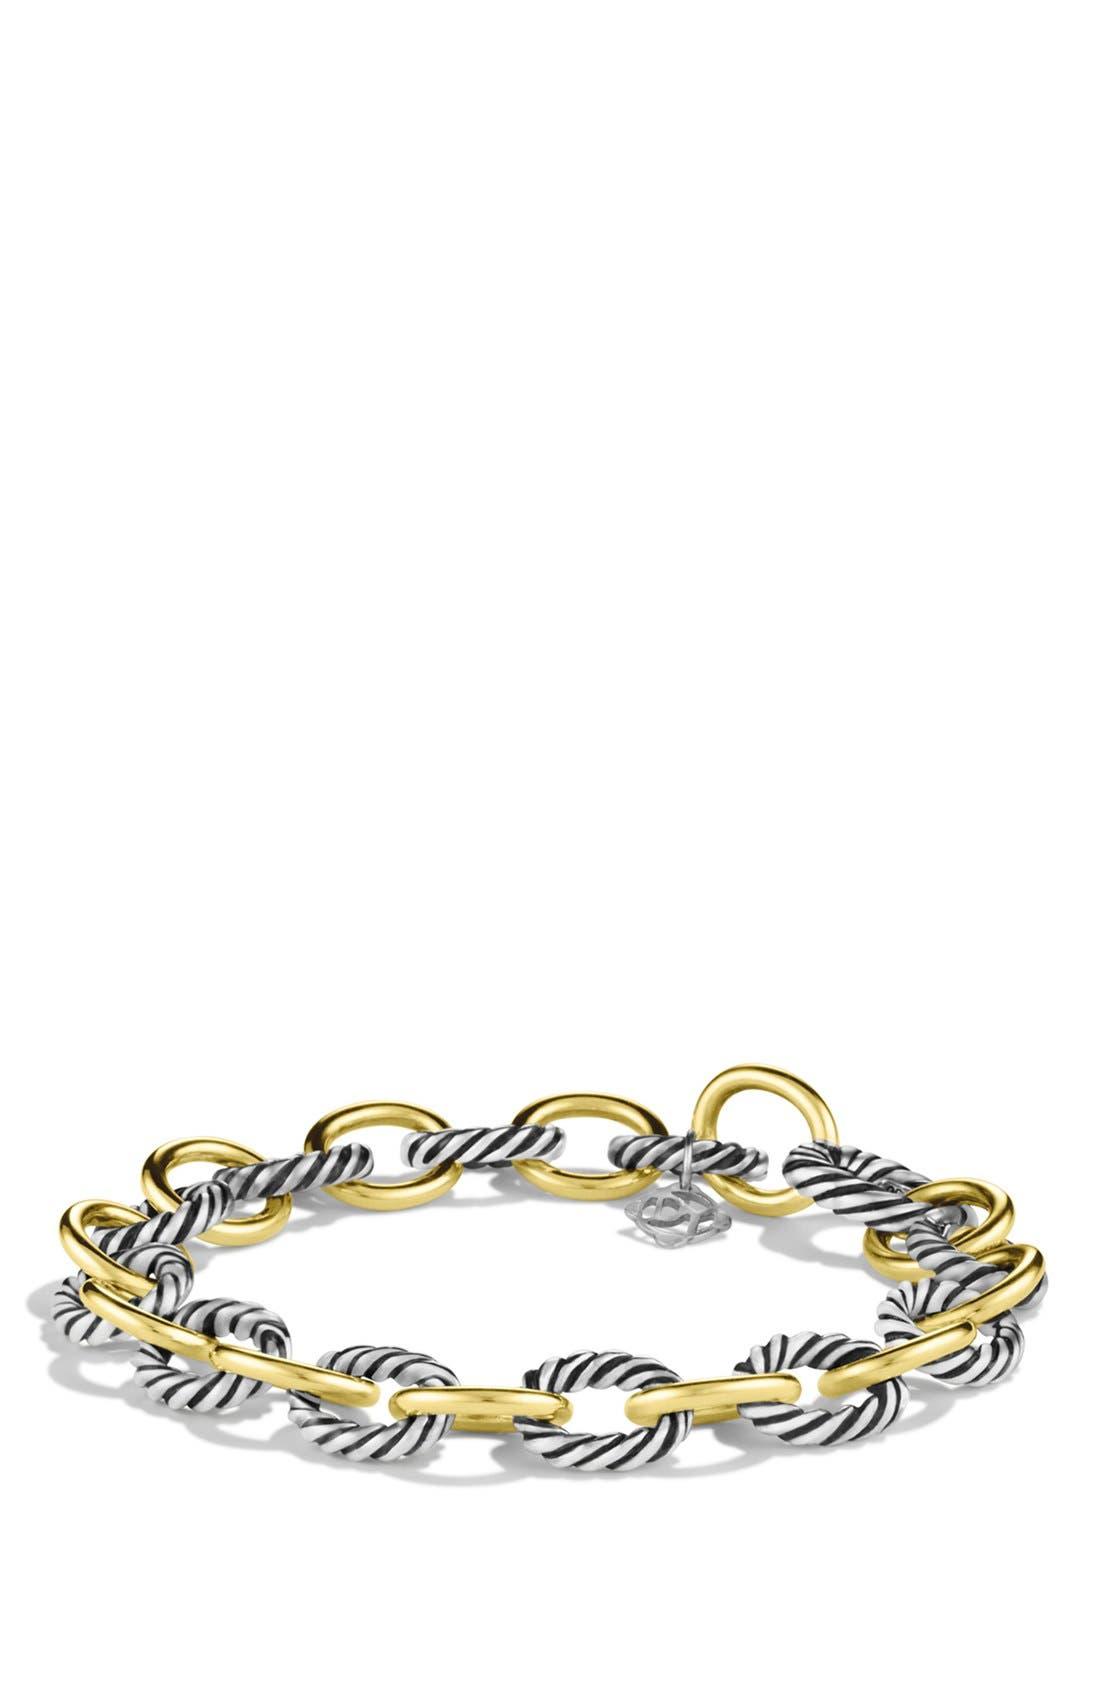 Alternate Image 1 Selected - David Yurman 'Oval' Link Bracelet with Gold